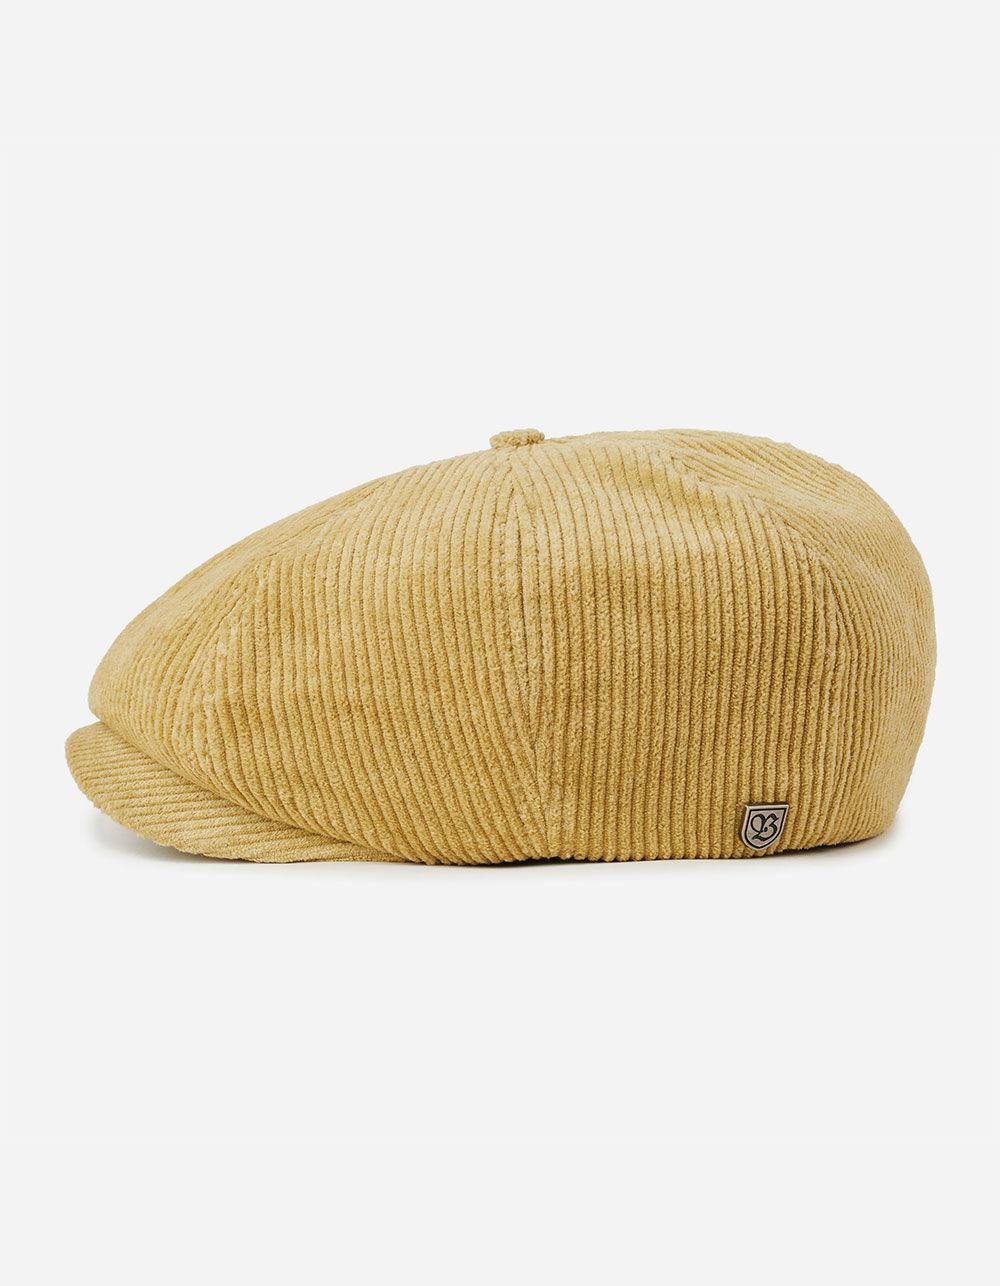 17931592b46 BRIXTON BROOD SNAP CAP (MUSTARD CORD) — CULT HARPER